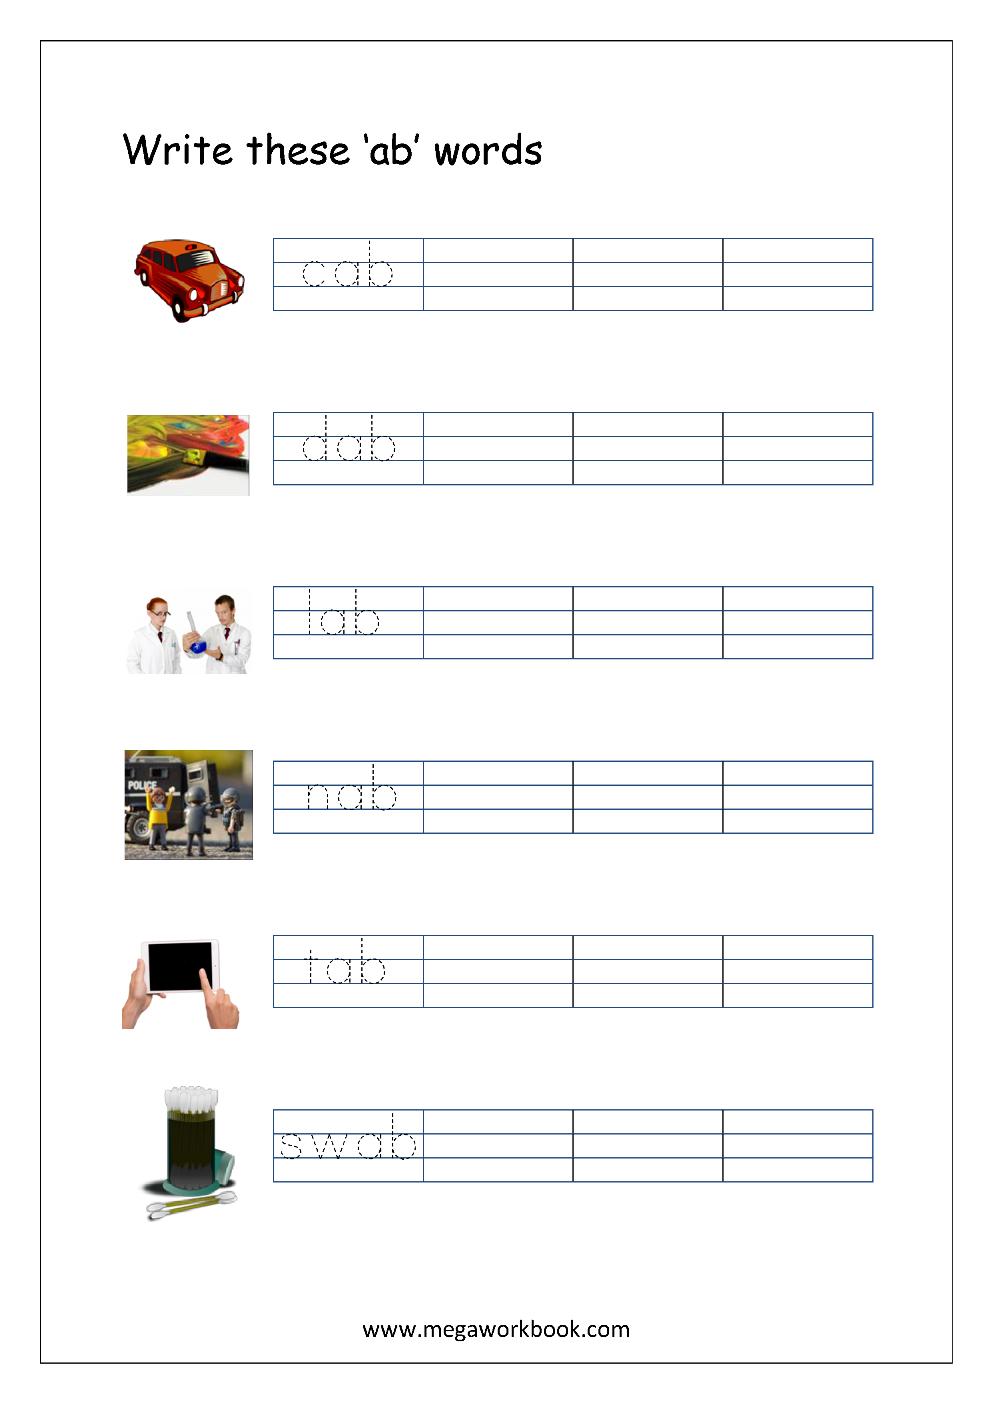 Free Printable Cvc Words Writing Worksheets For Kids Three Letter Rhyming Words For Kindergarten Megaworkbook